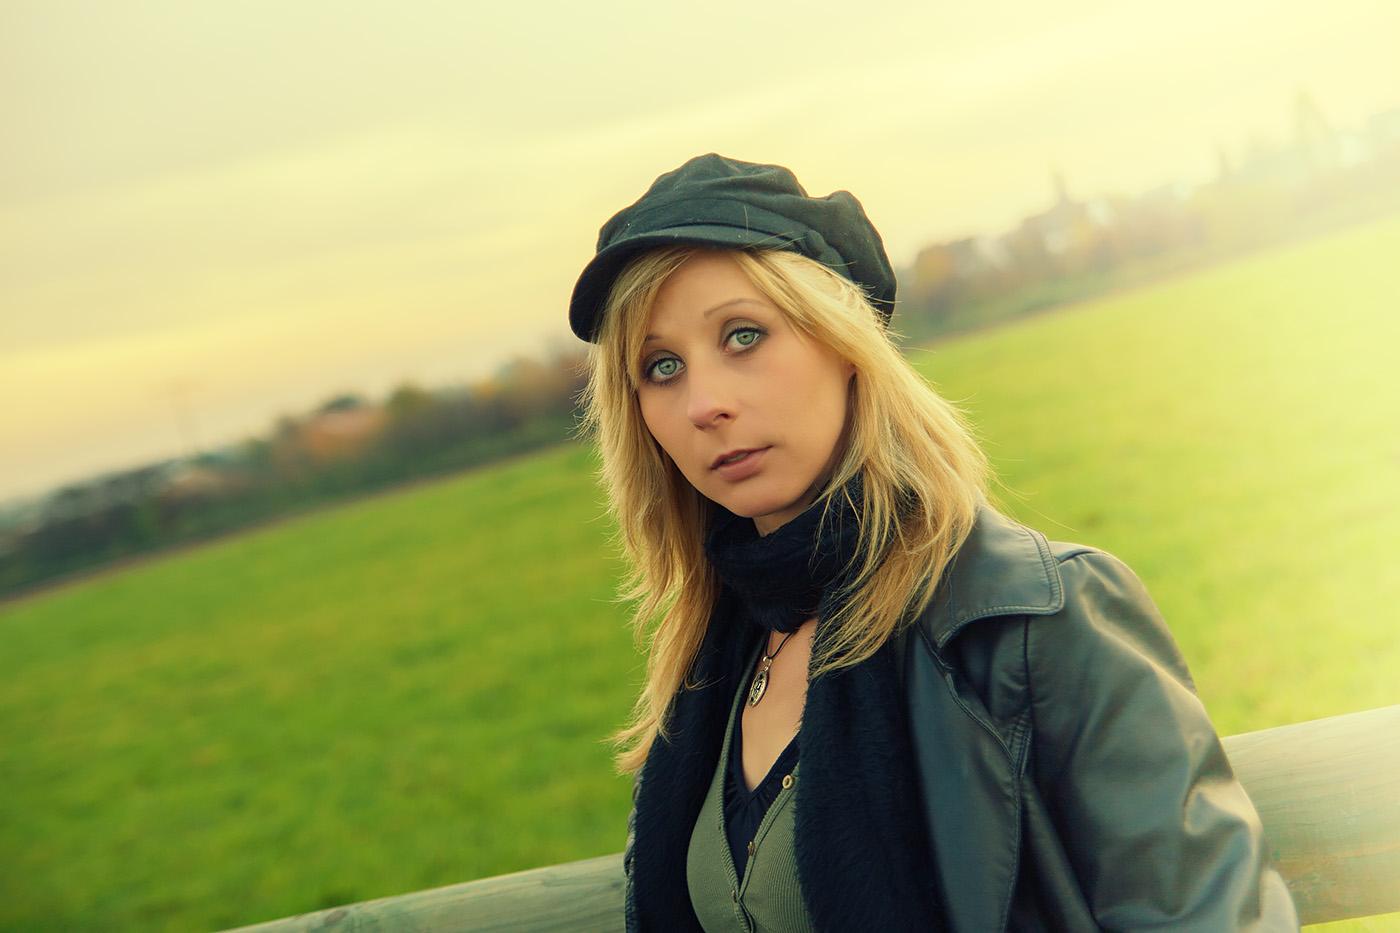 Blonde Frau mit Cap im Feld